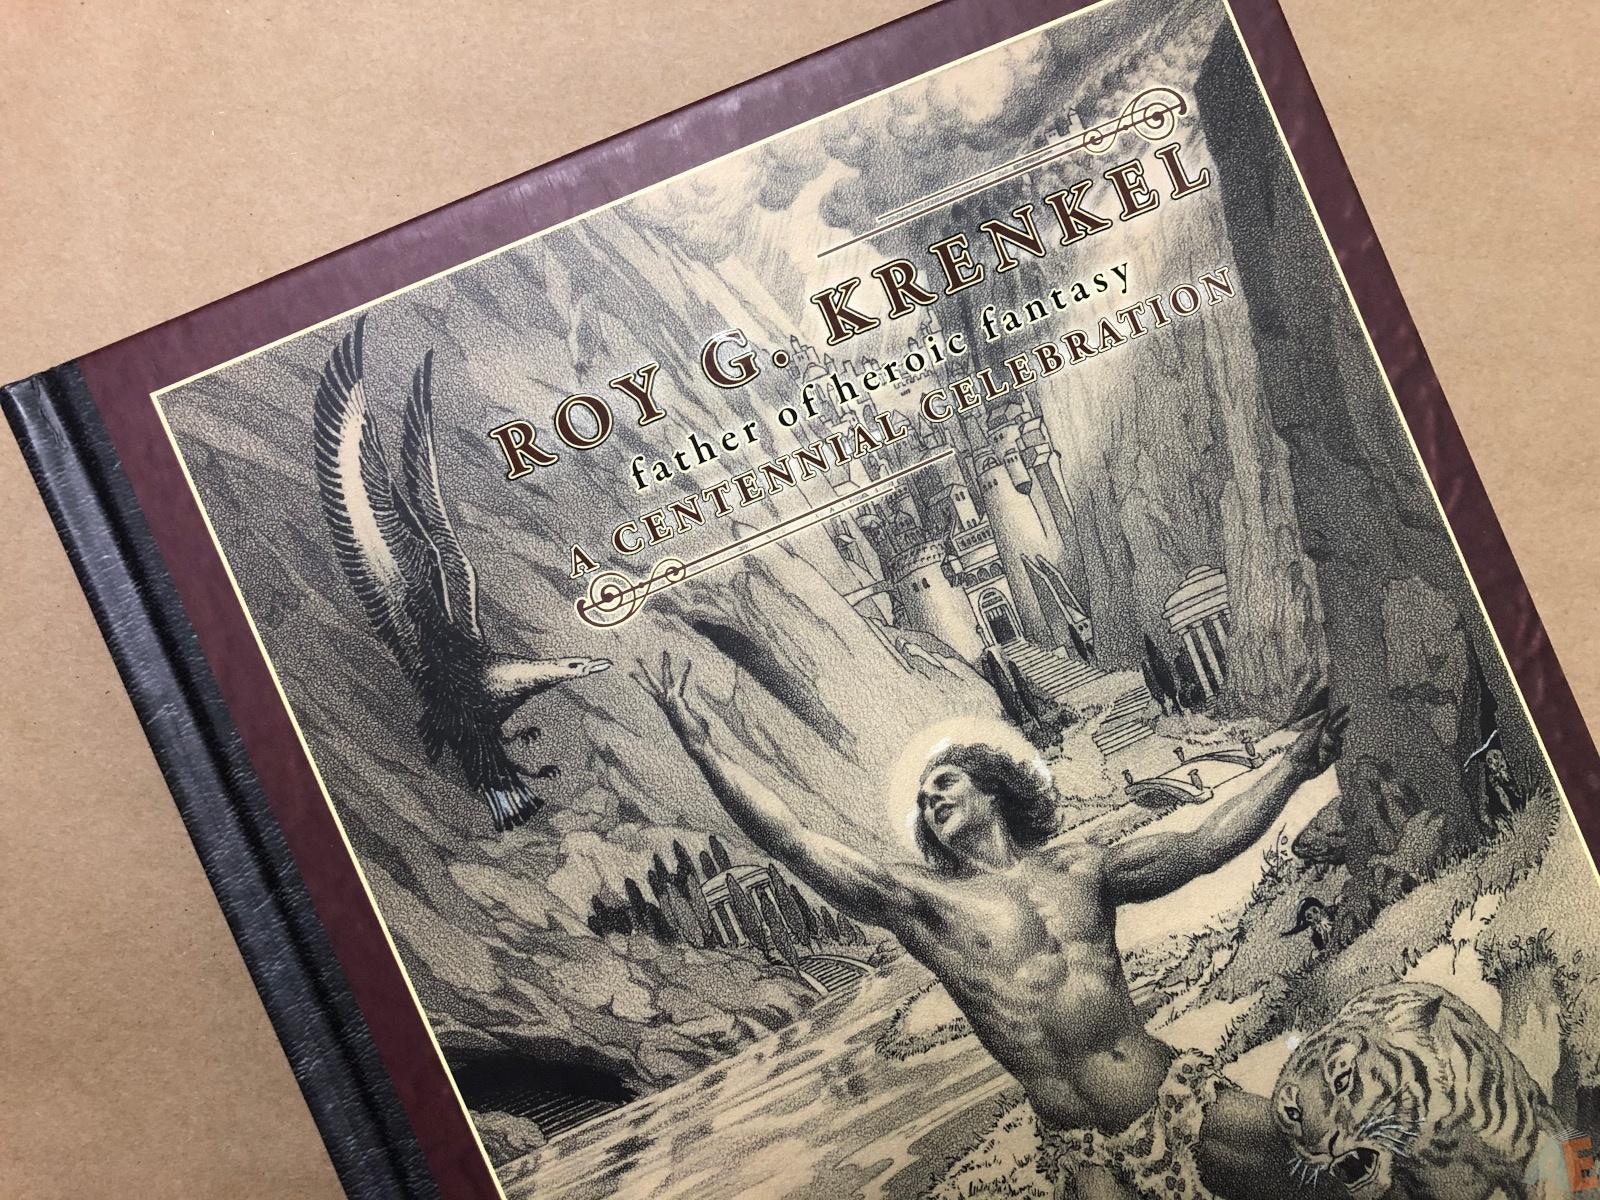 Roy G. Krenkel: Father of Heroic Fantasy - A Centennial Celebration 65